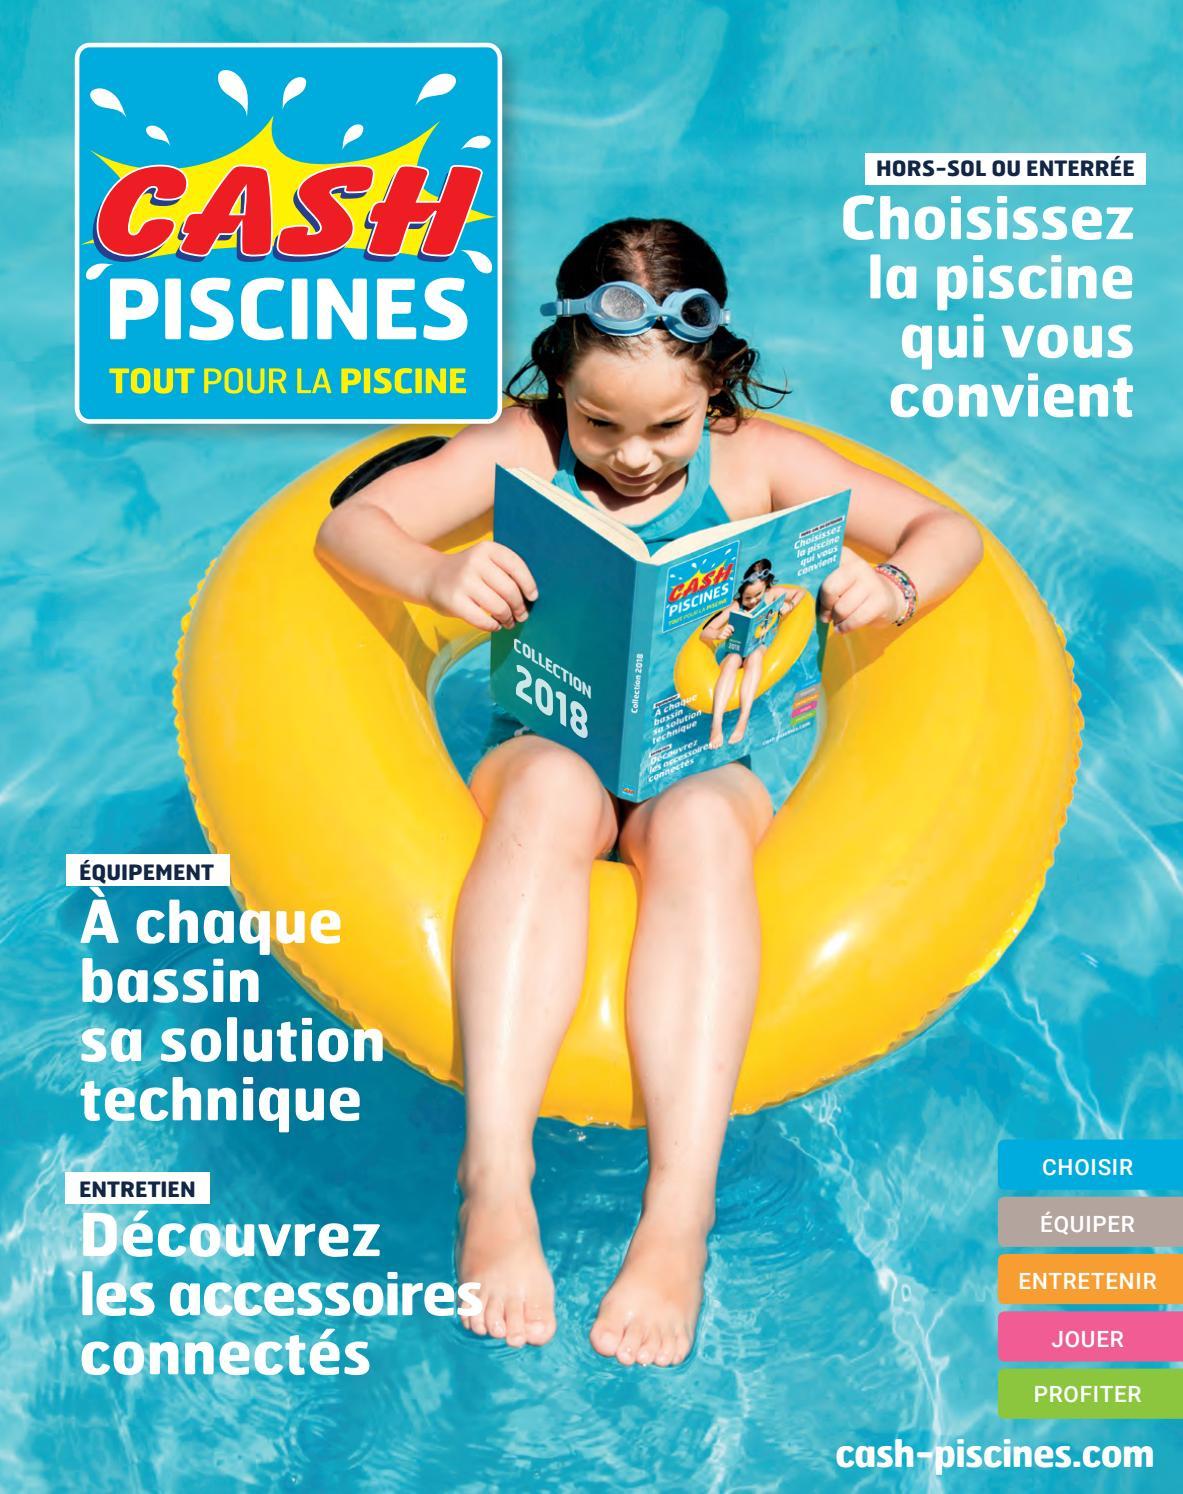 Catalogue Cash Piscine 2018 By Octave Octave - Issuu encequiconcerne Cash Piscine Montauban